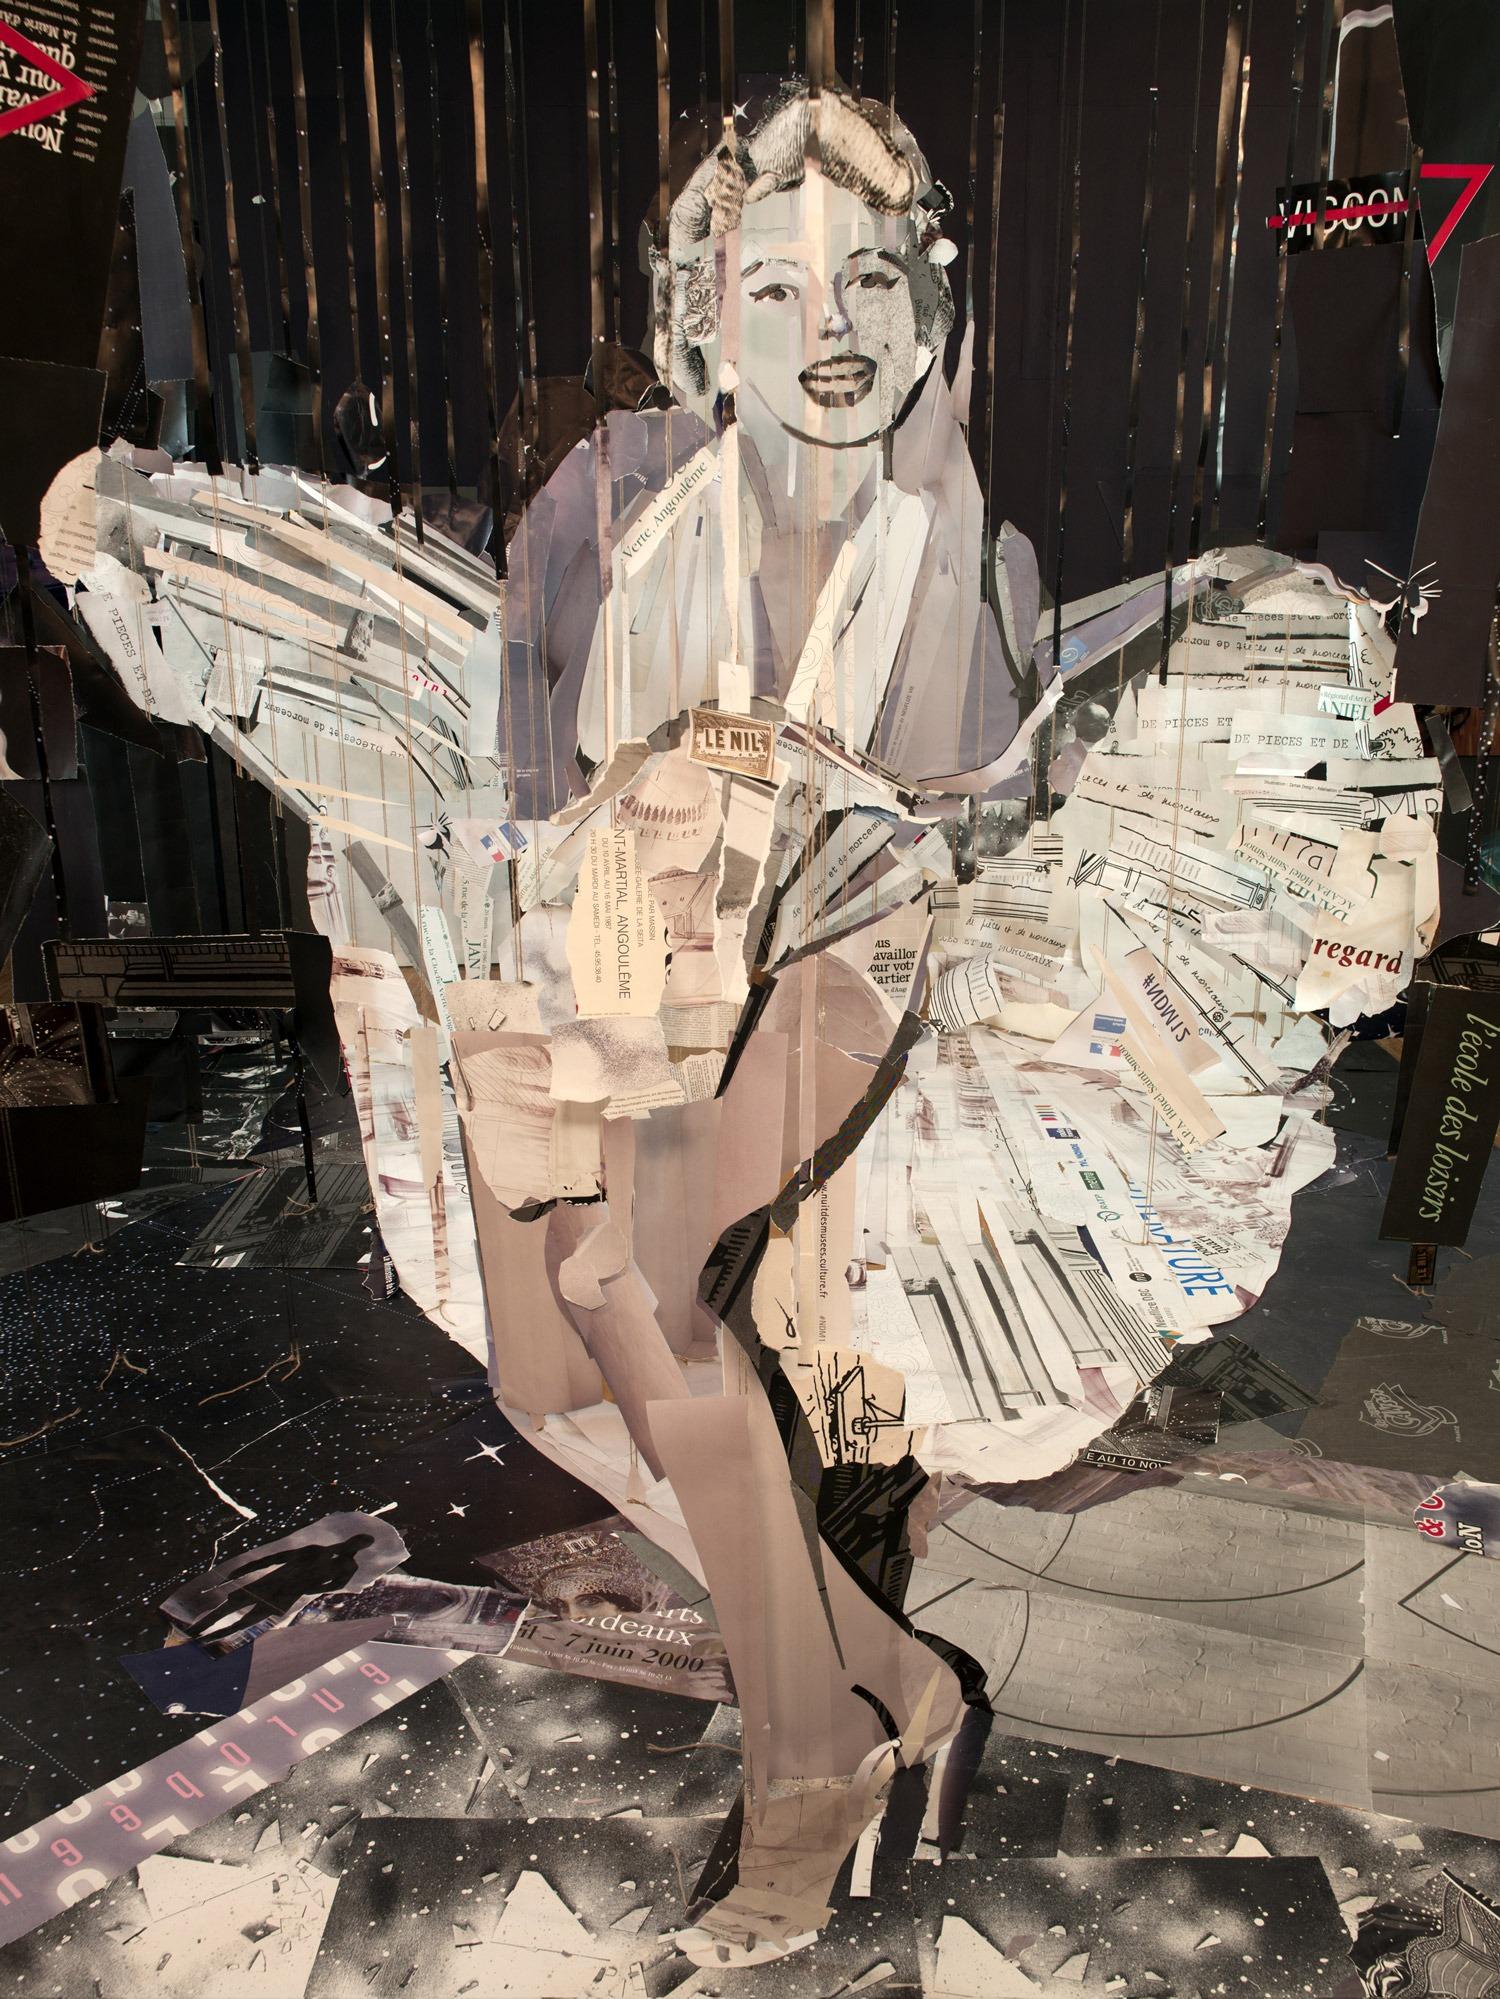 anamorphic portrait marilyn bernard pras.jpg